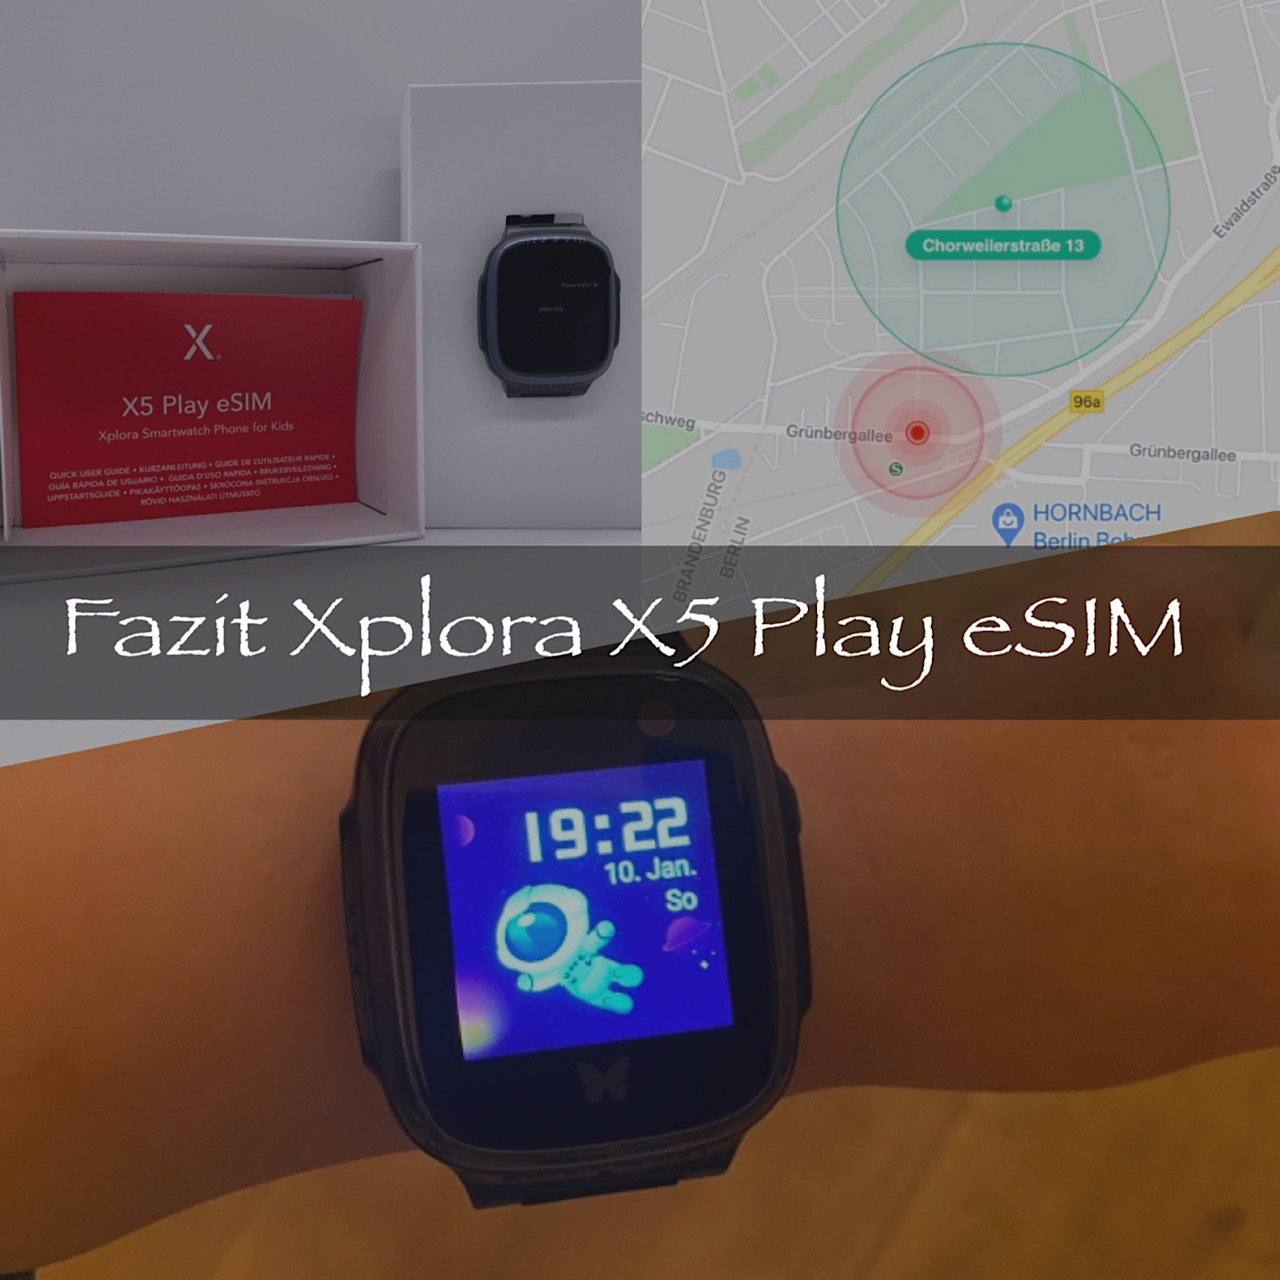 Xplora X5 Play eSIM – mein Fazit